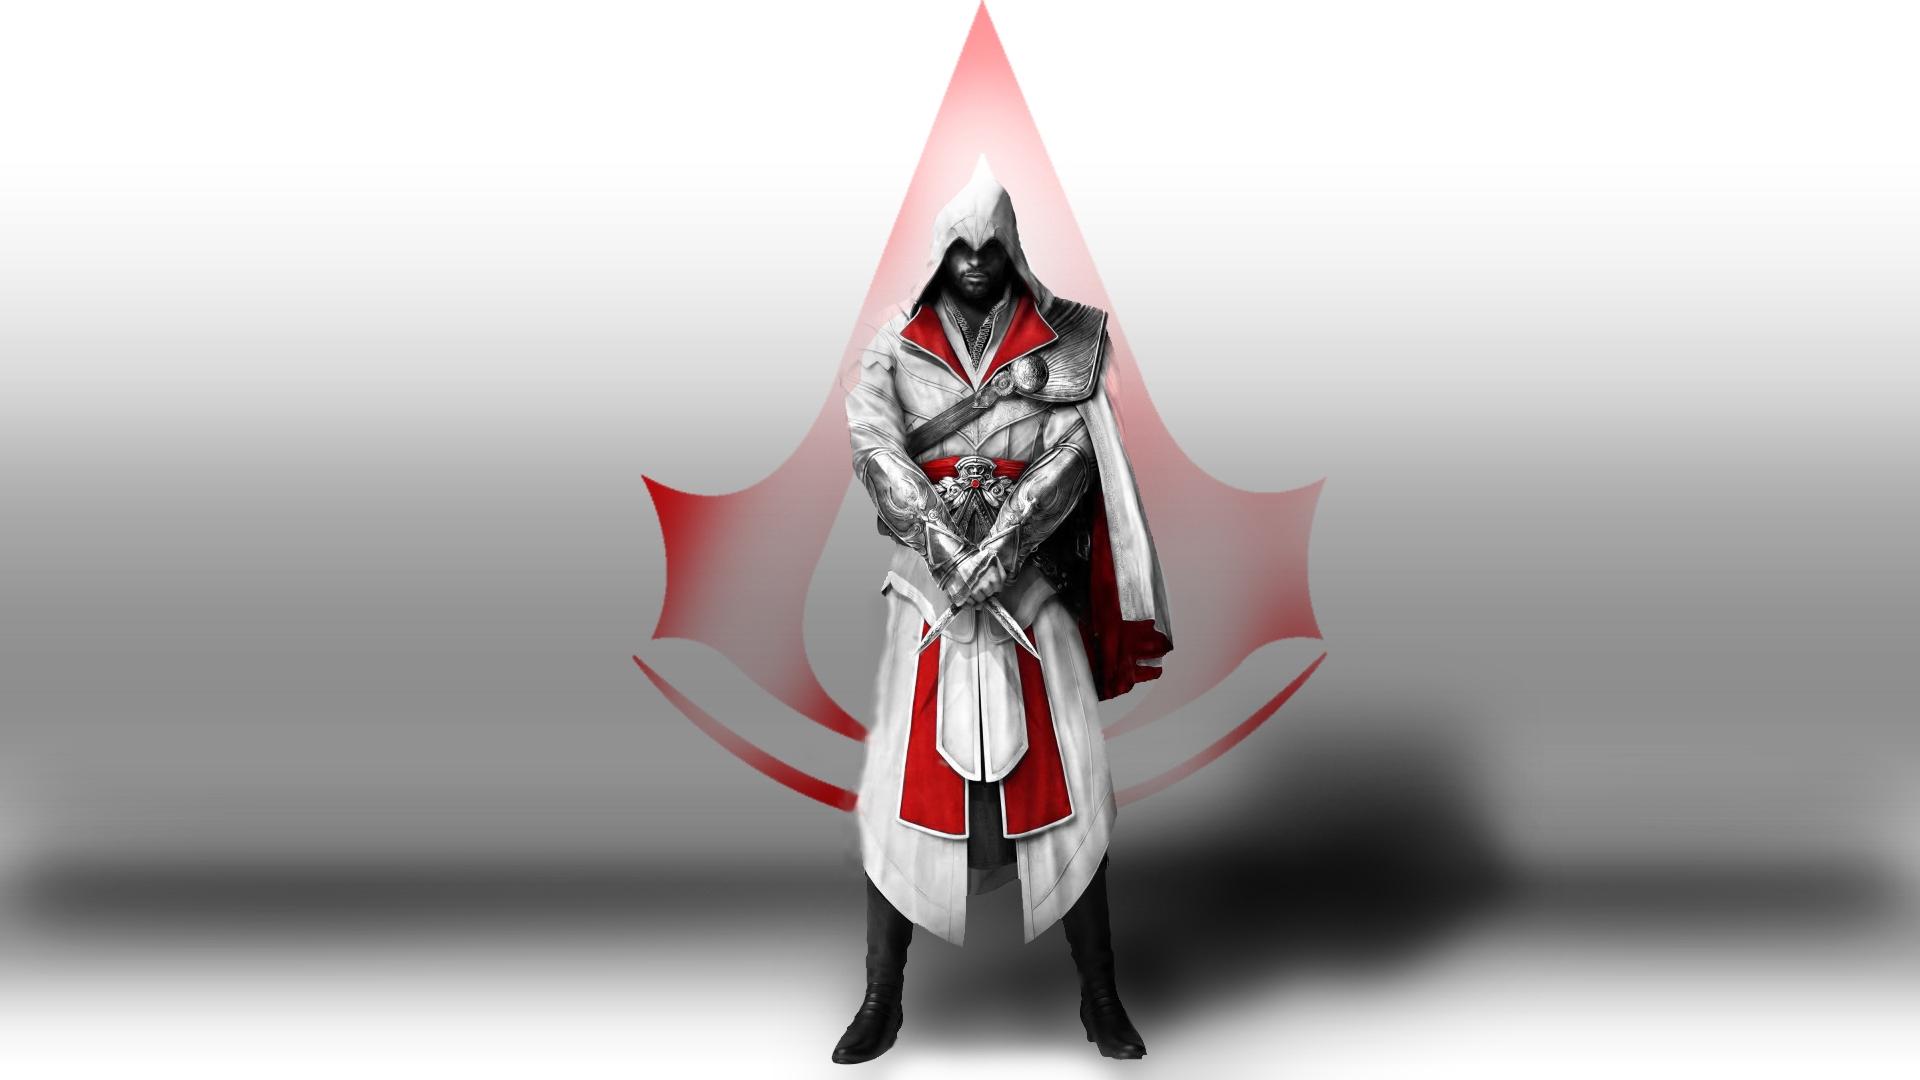 Wallpaper Assassins Creed Desmond Miles Assassins Symbol